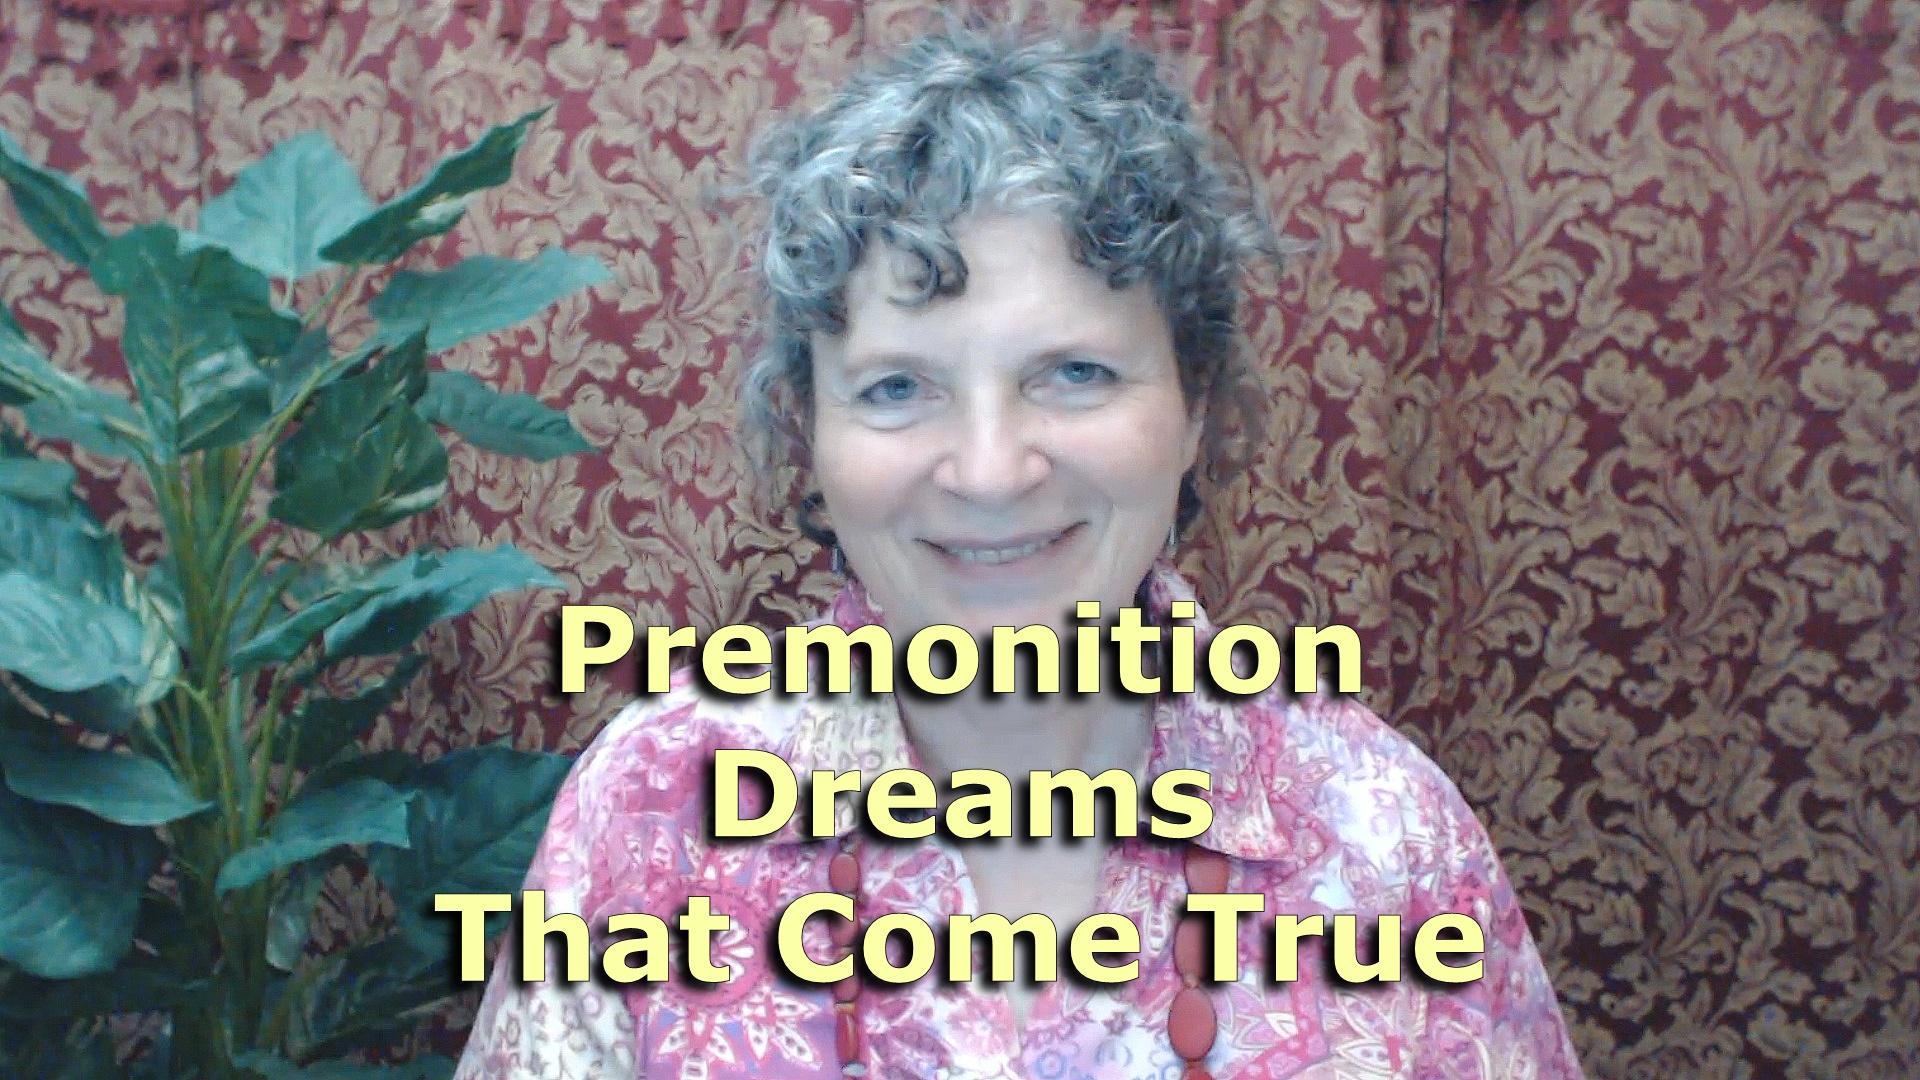 Premonition Dreams That Come True